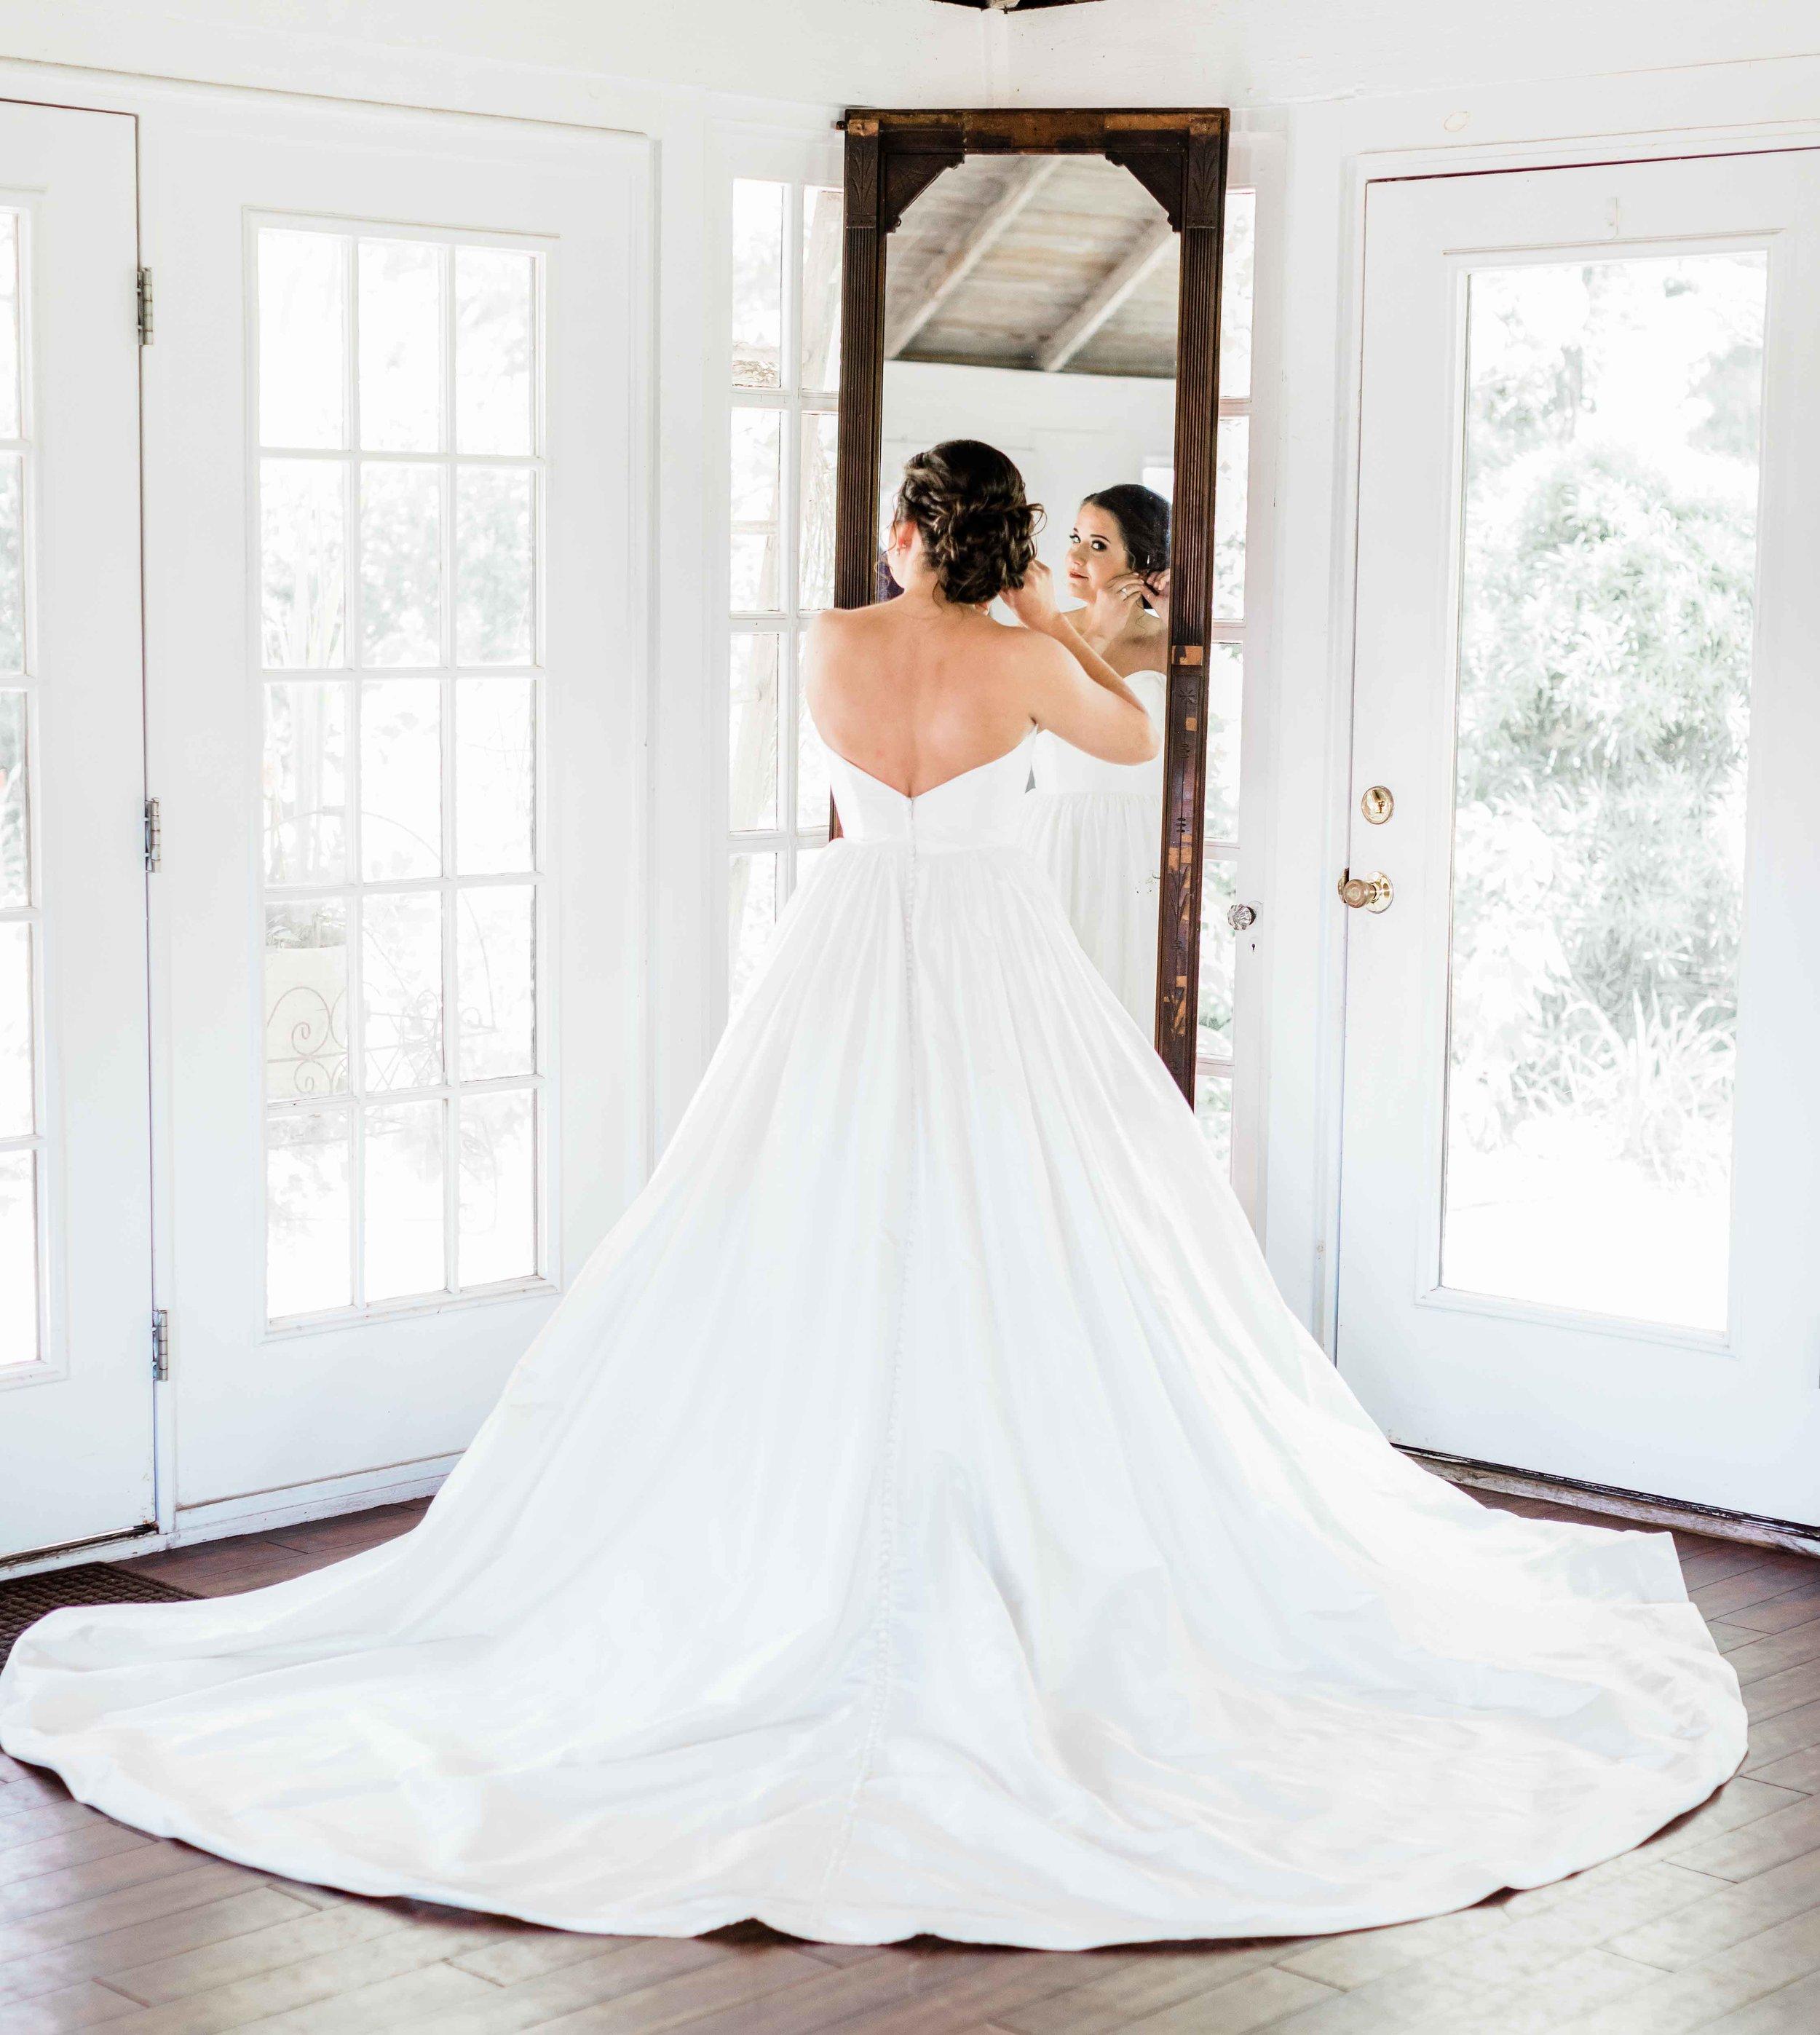 20190427-Southern Lens Photography- Savannah Wedding Photographer-Screven and Caroline-201920.jpg